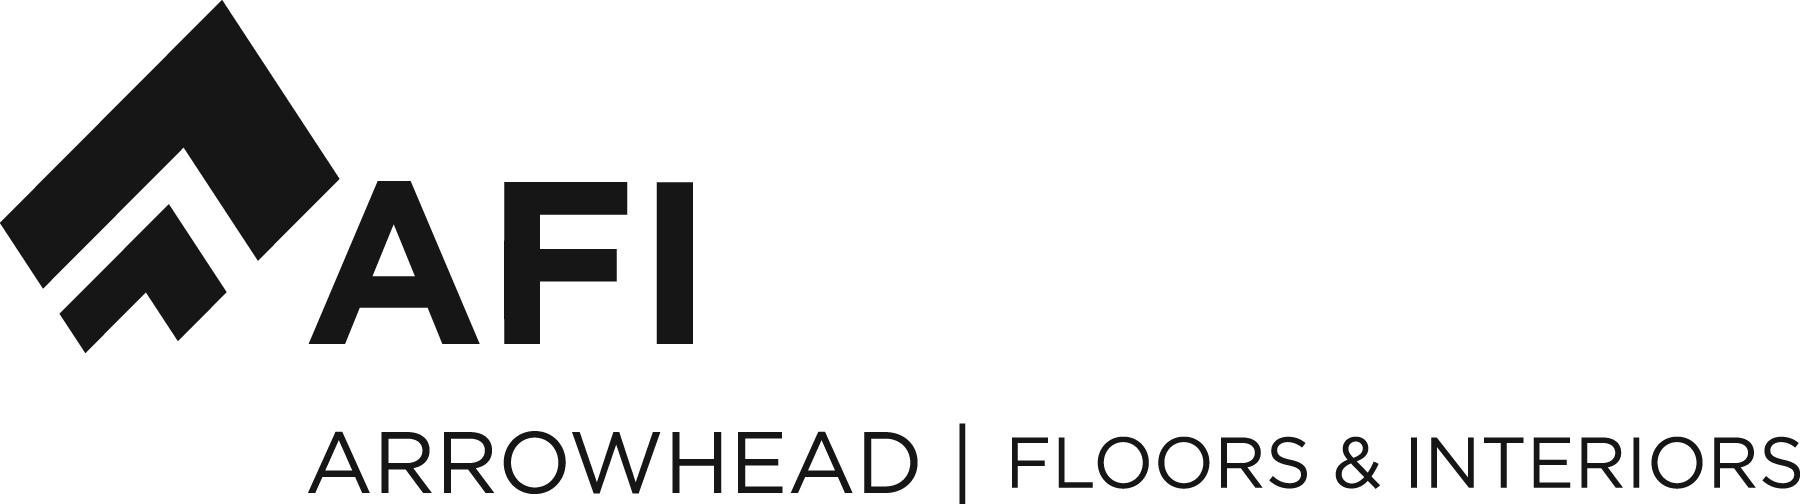 Arrowhead Floors & Interiors